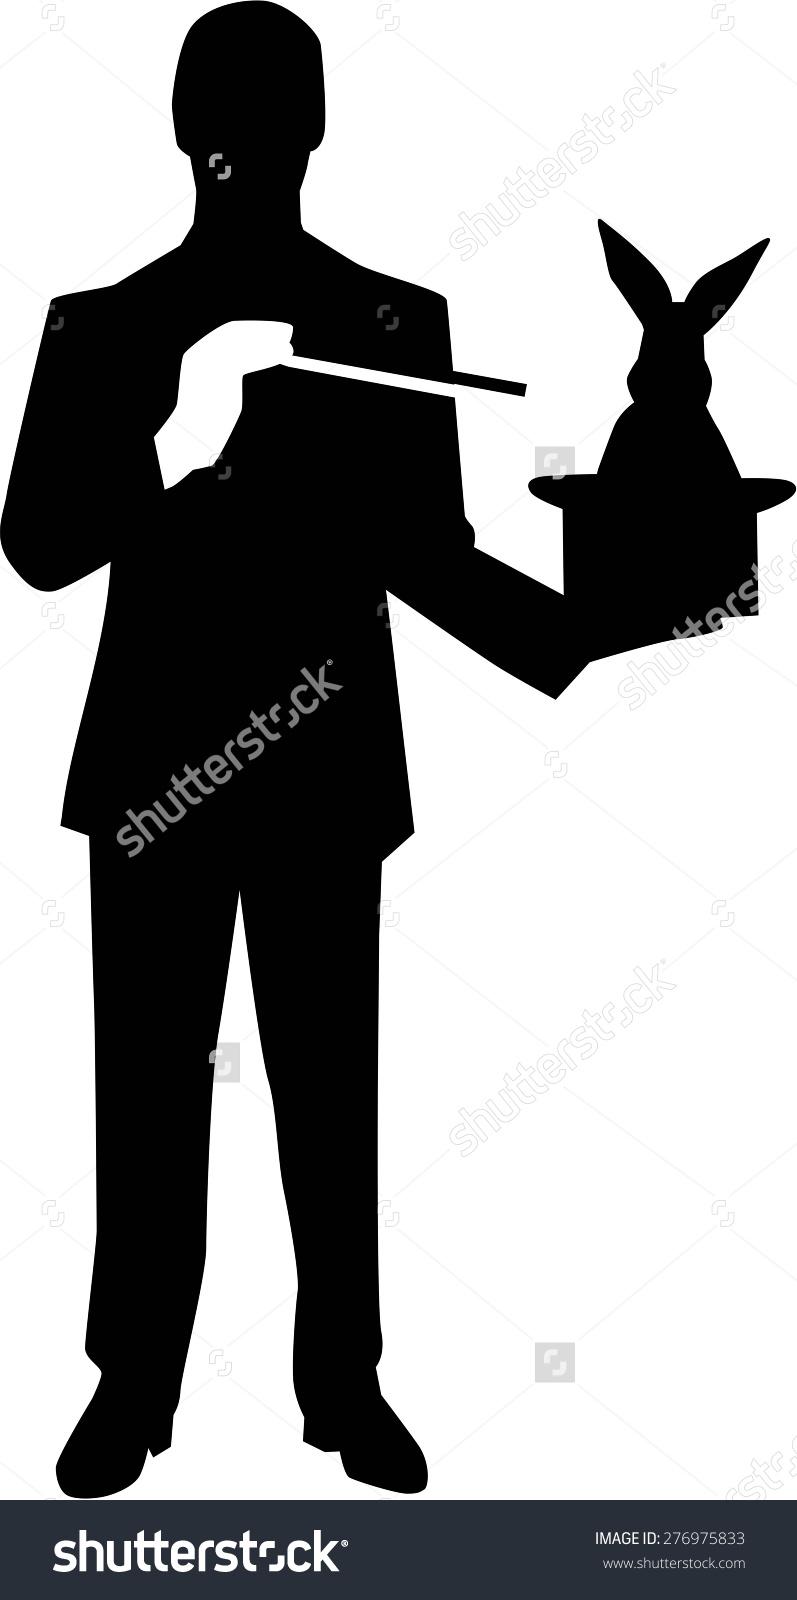 Magician clipart silhouette #10